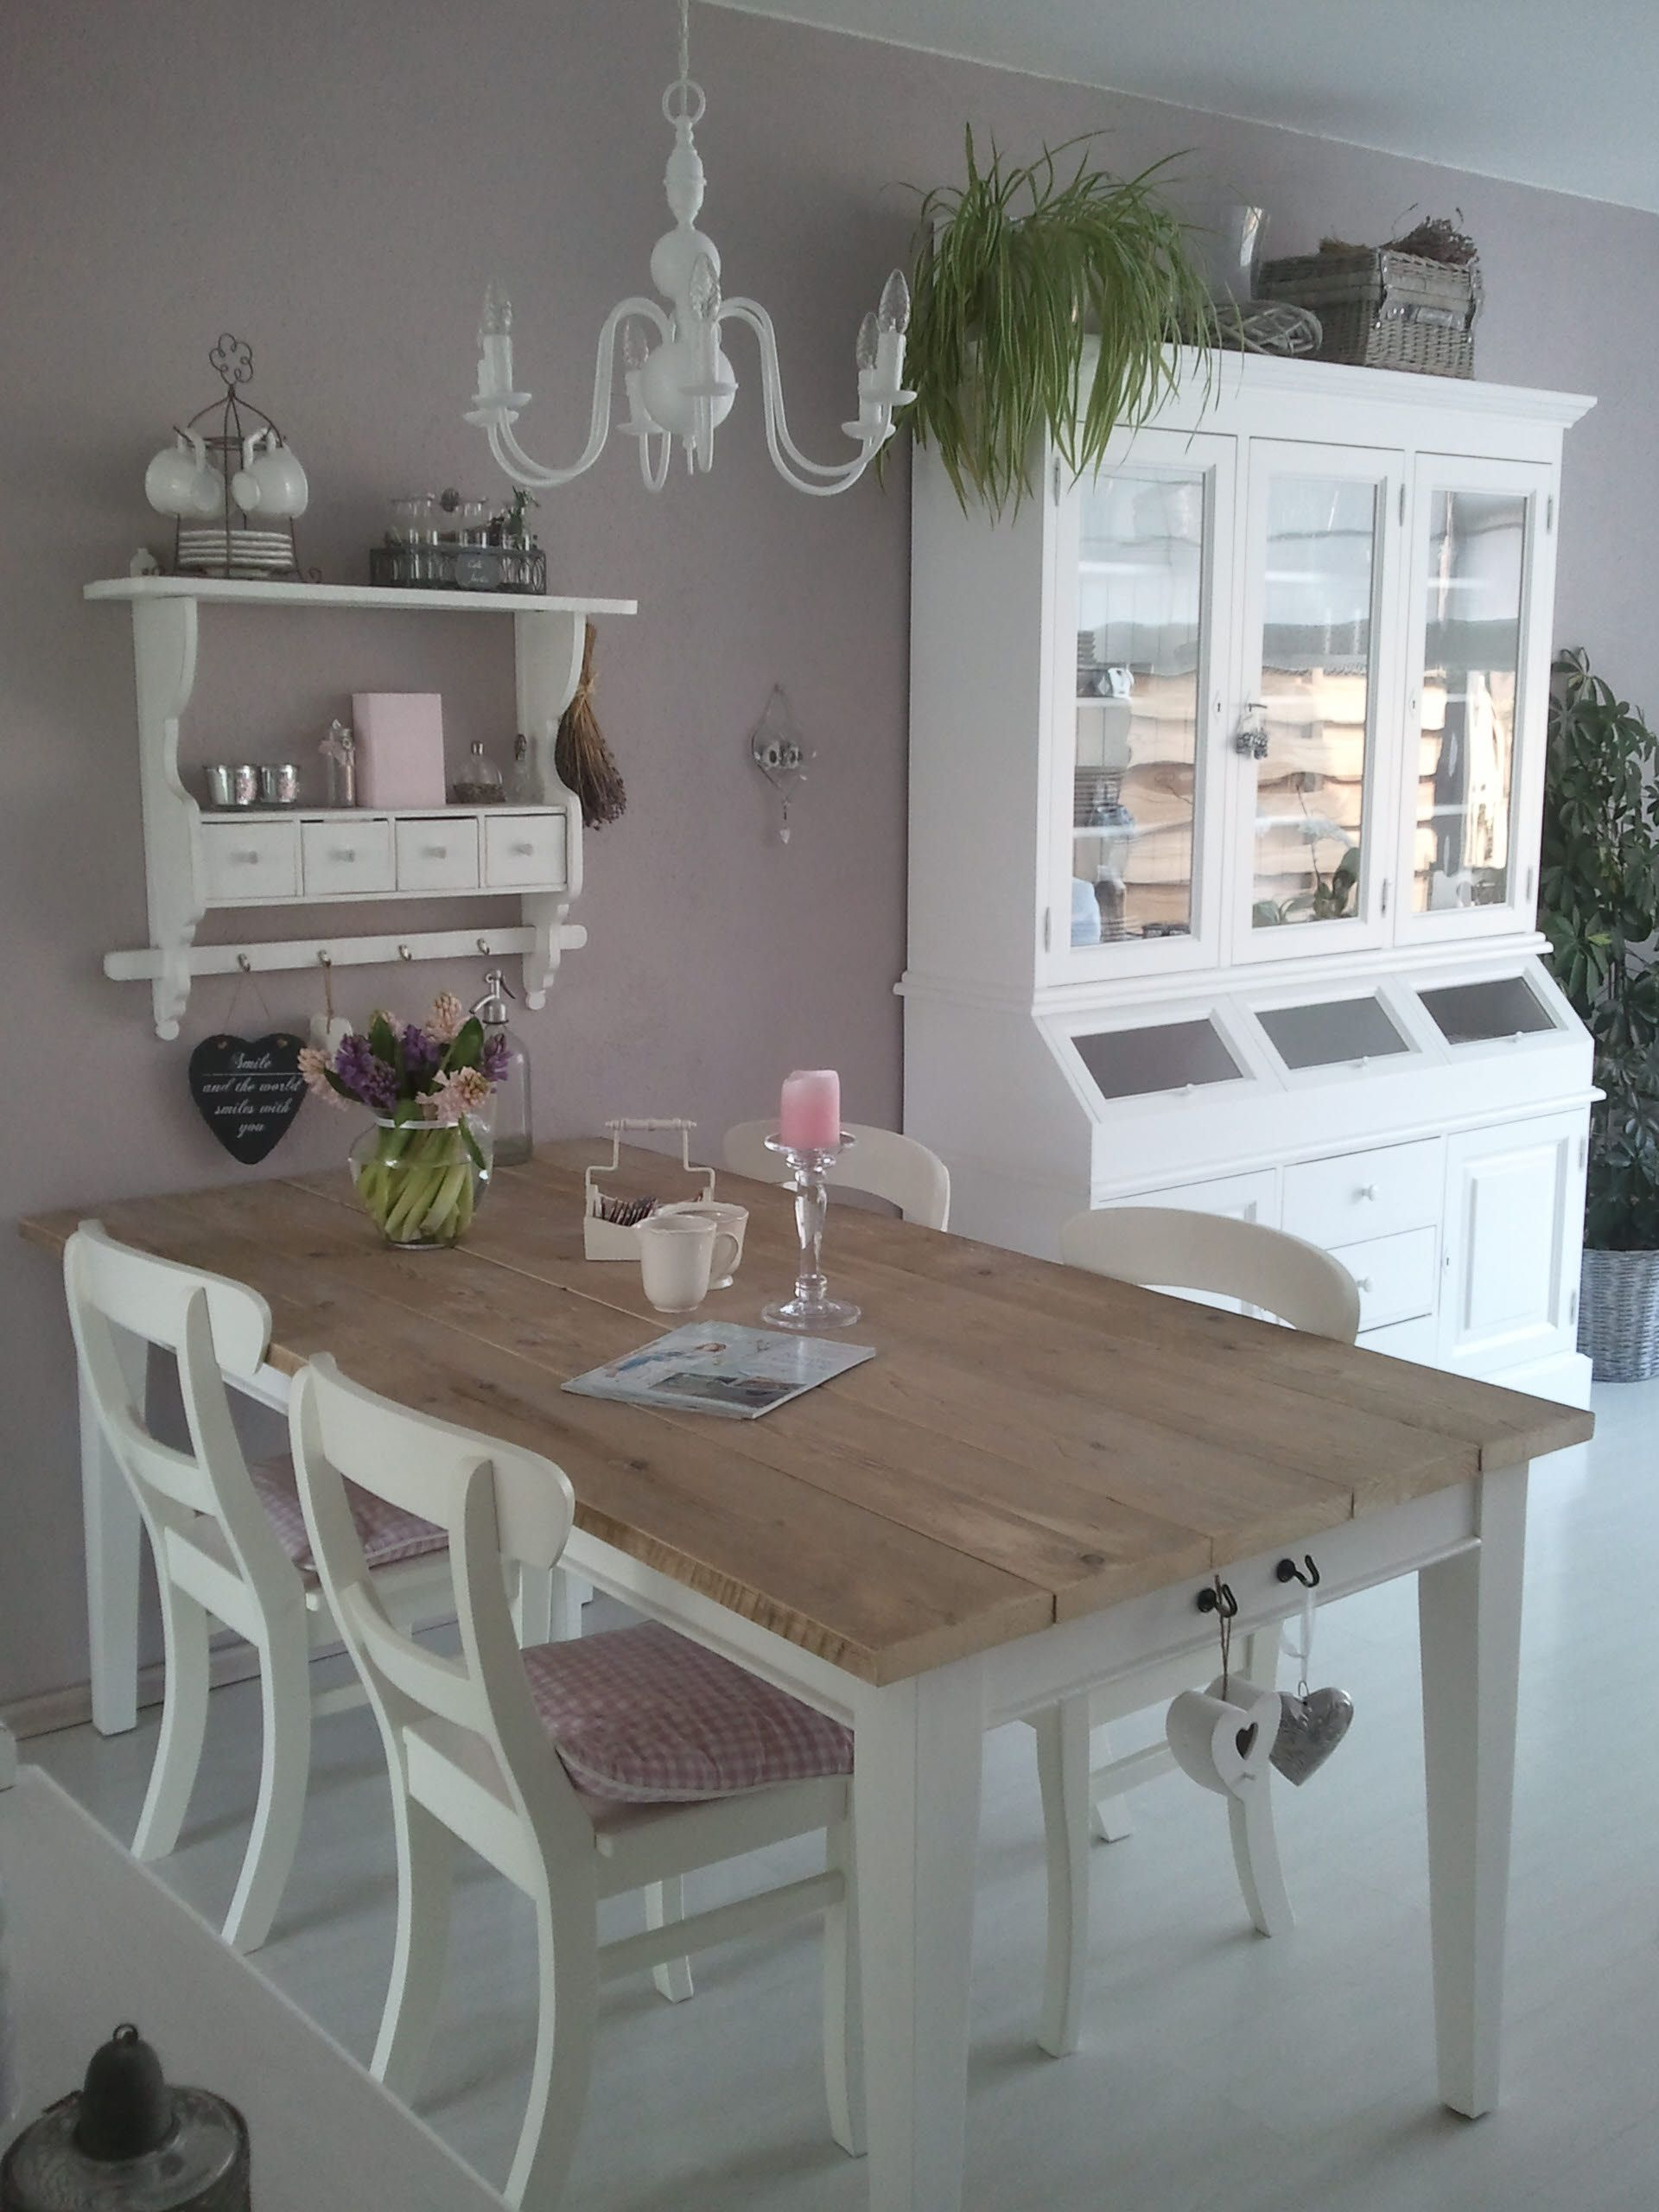 Landelijke stijl keuken woonkamer home inspiration for Landelijke woonkamer